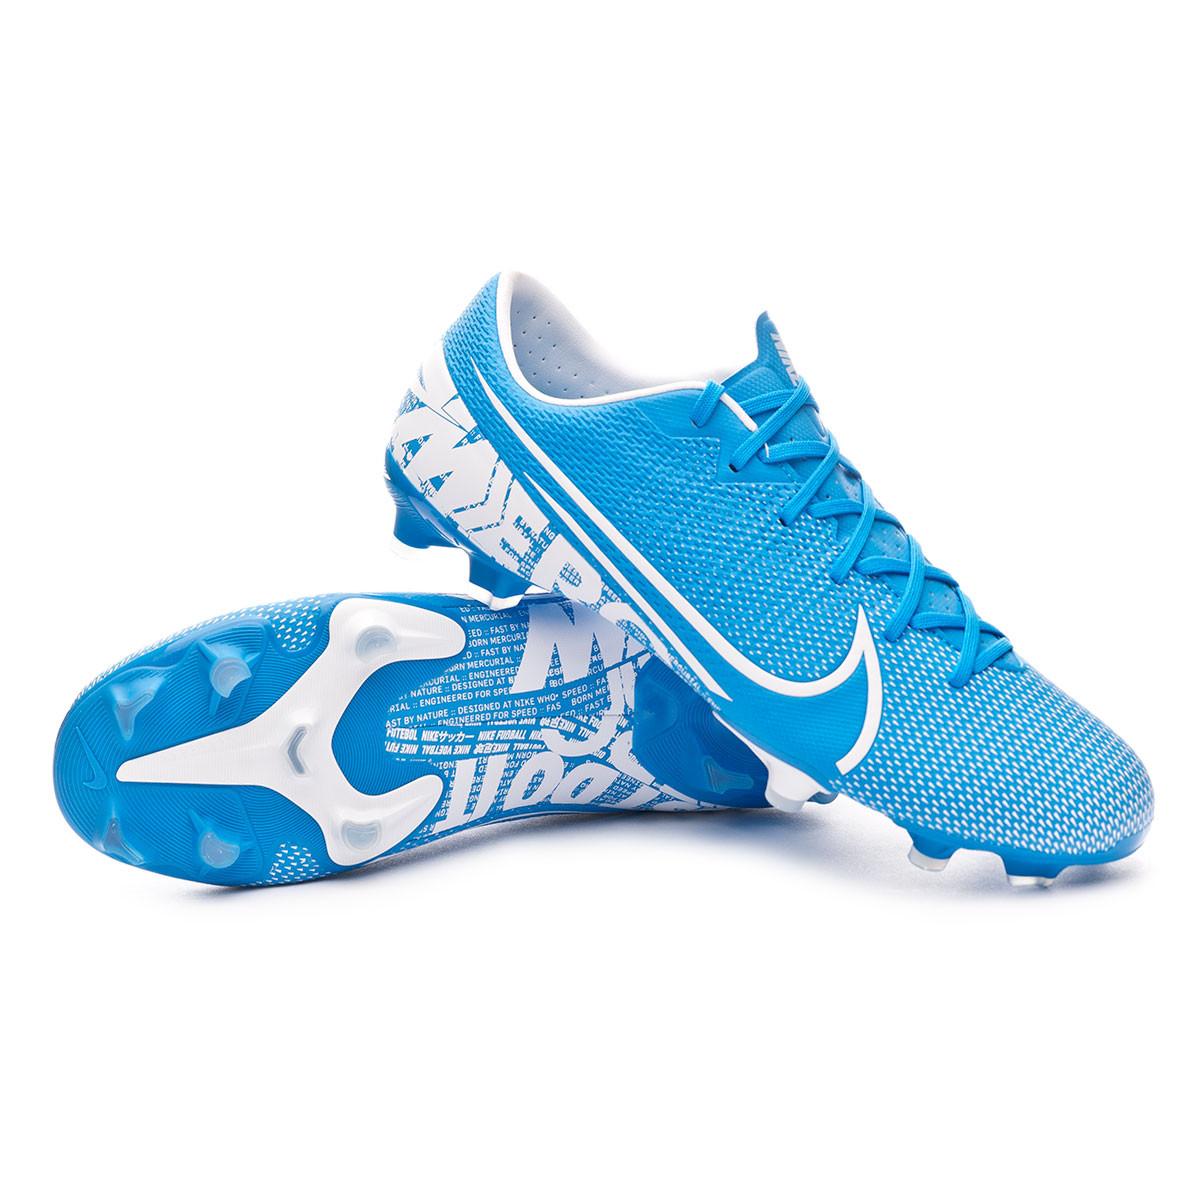 anillo entre Extremadamente importante  Football Boots Nike Mercurial Vapor XIII Academy FG/MG Blue  hero-White-Obsidian - Football store Fútbol Emotion